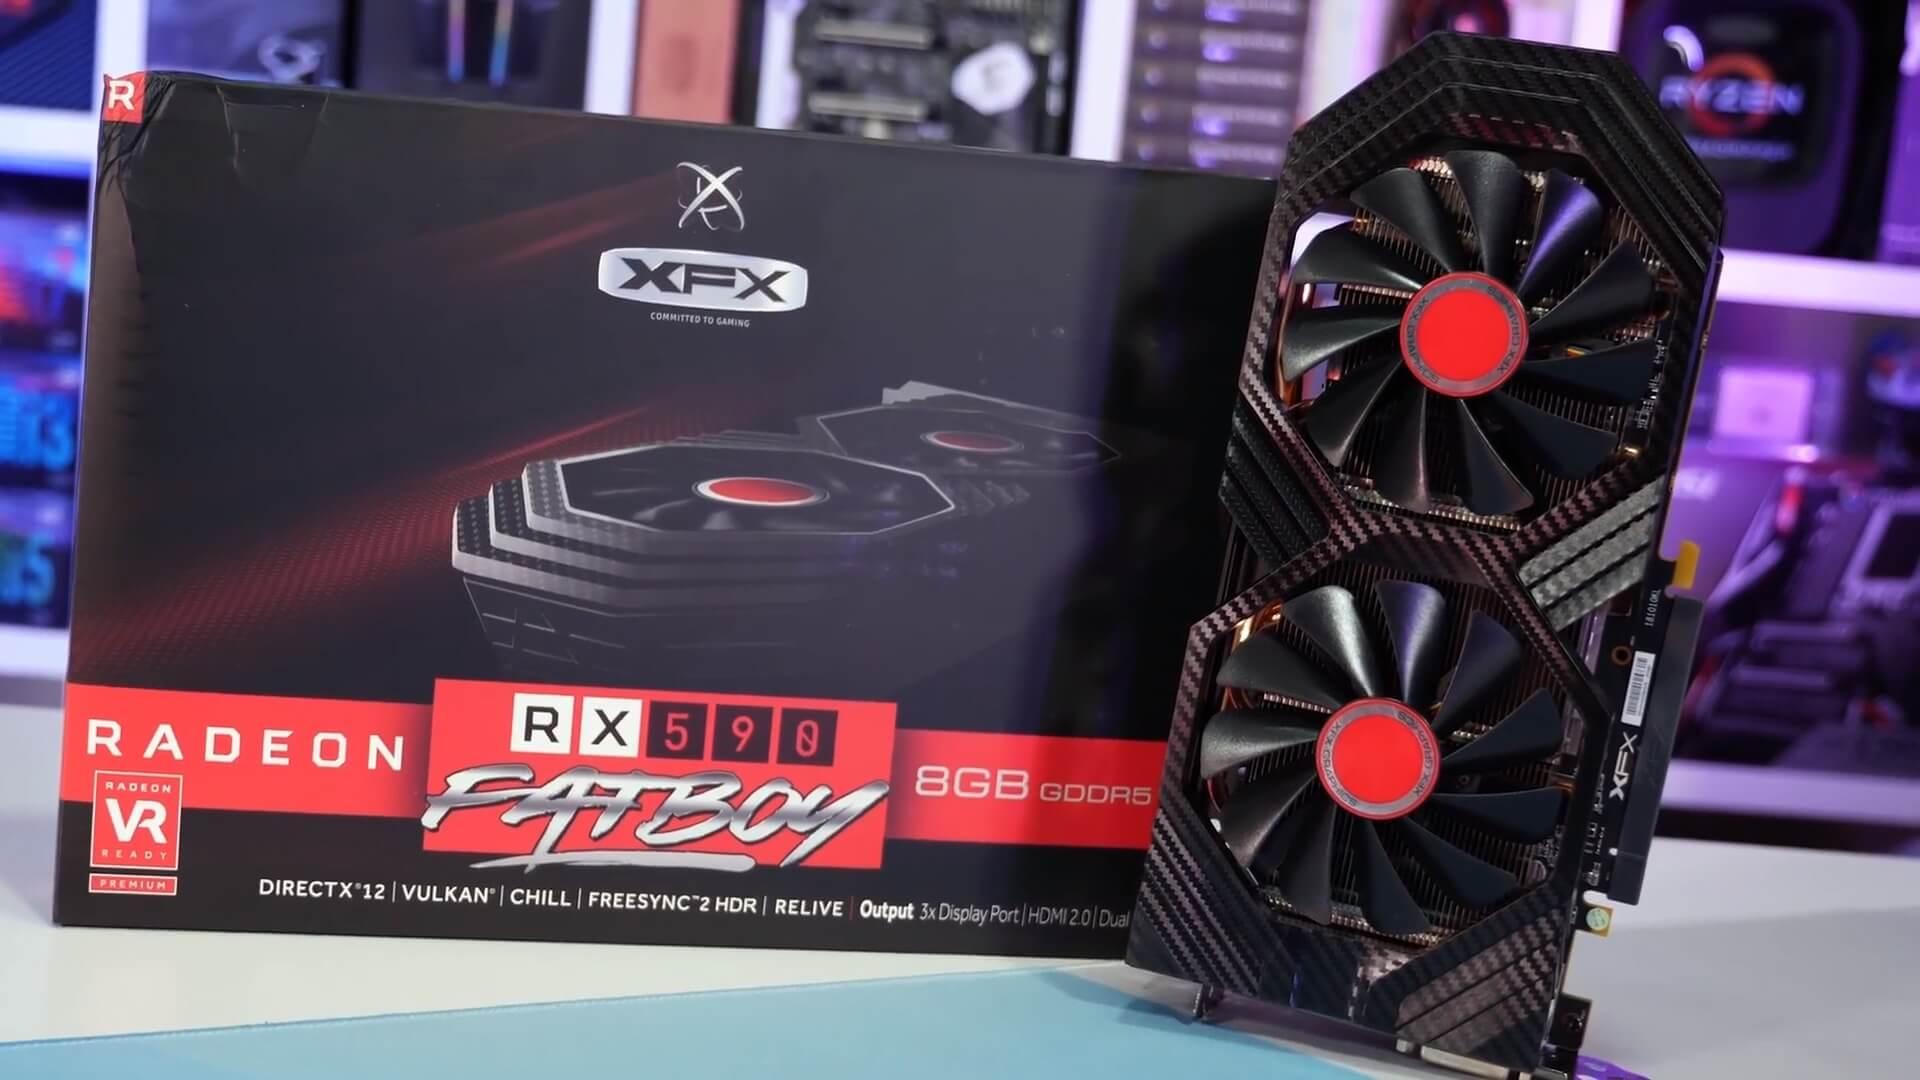 Radeon Rx 590 Vs Rx 580 Vs Geforce Gtx 1060